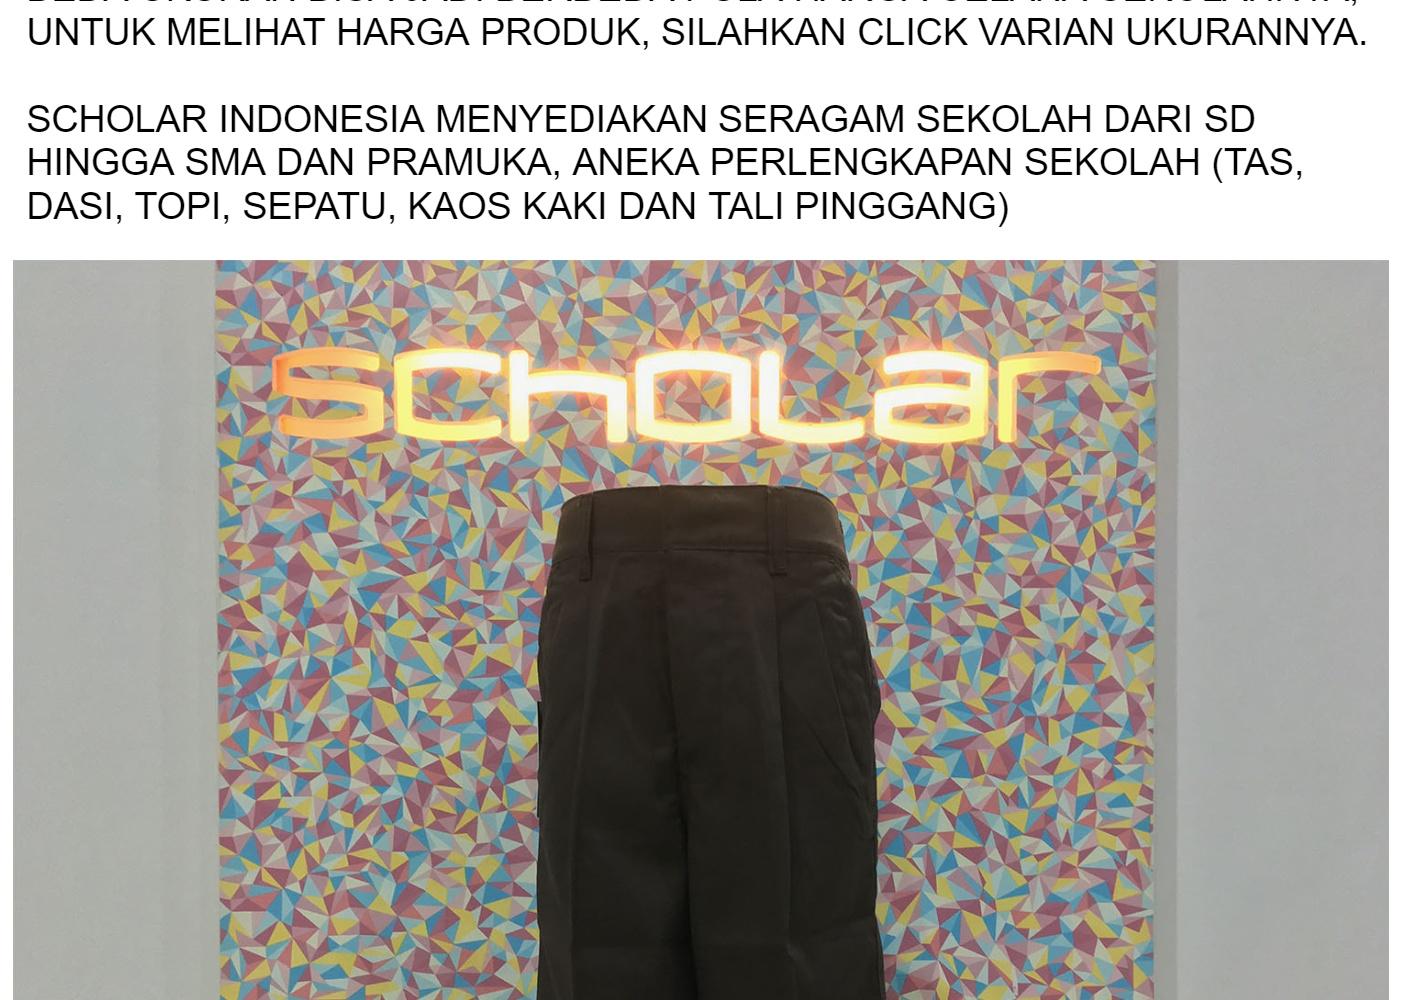 Jual Beli Celana Pramuka Pendek Smp Sma Scholar Indonesia Harga Rp Kaos Kaki Order Via Lazada